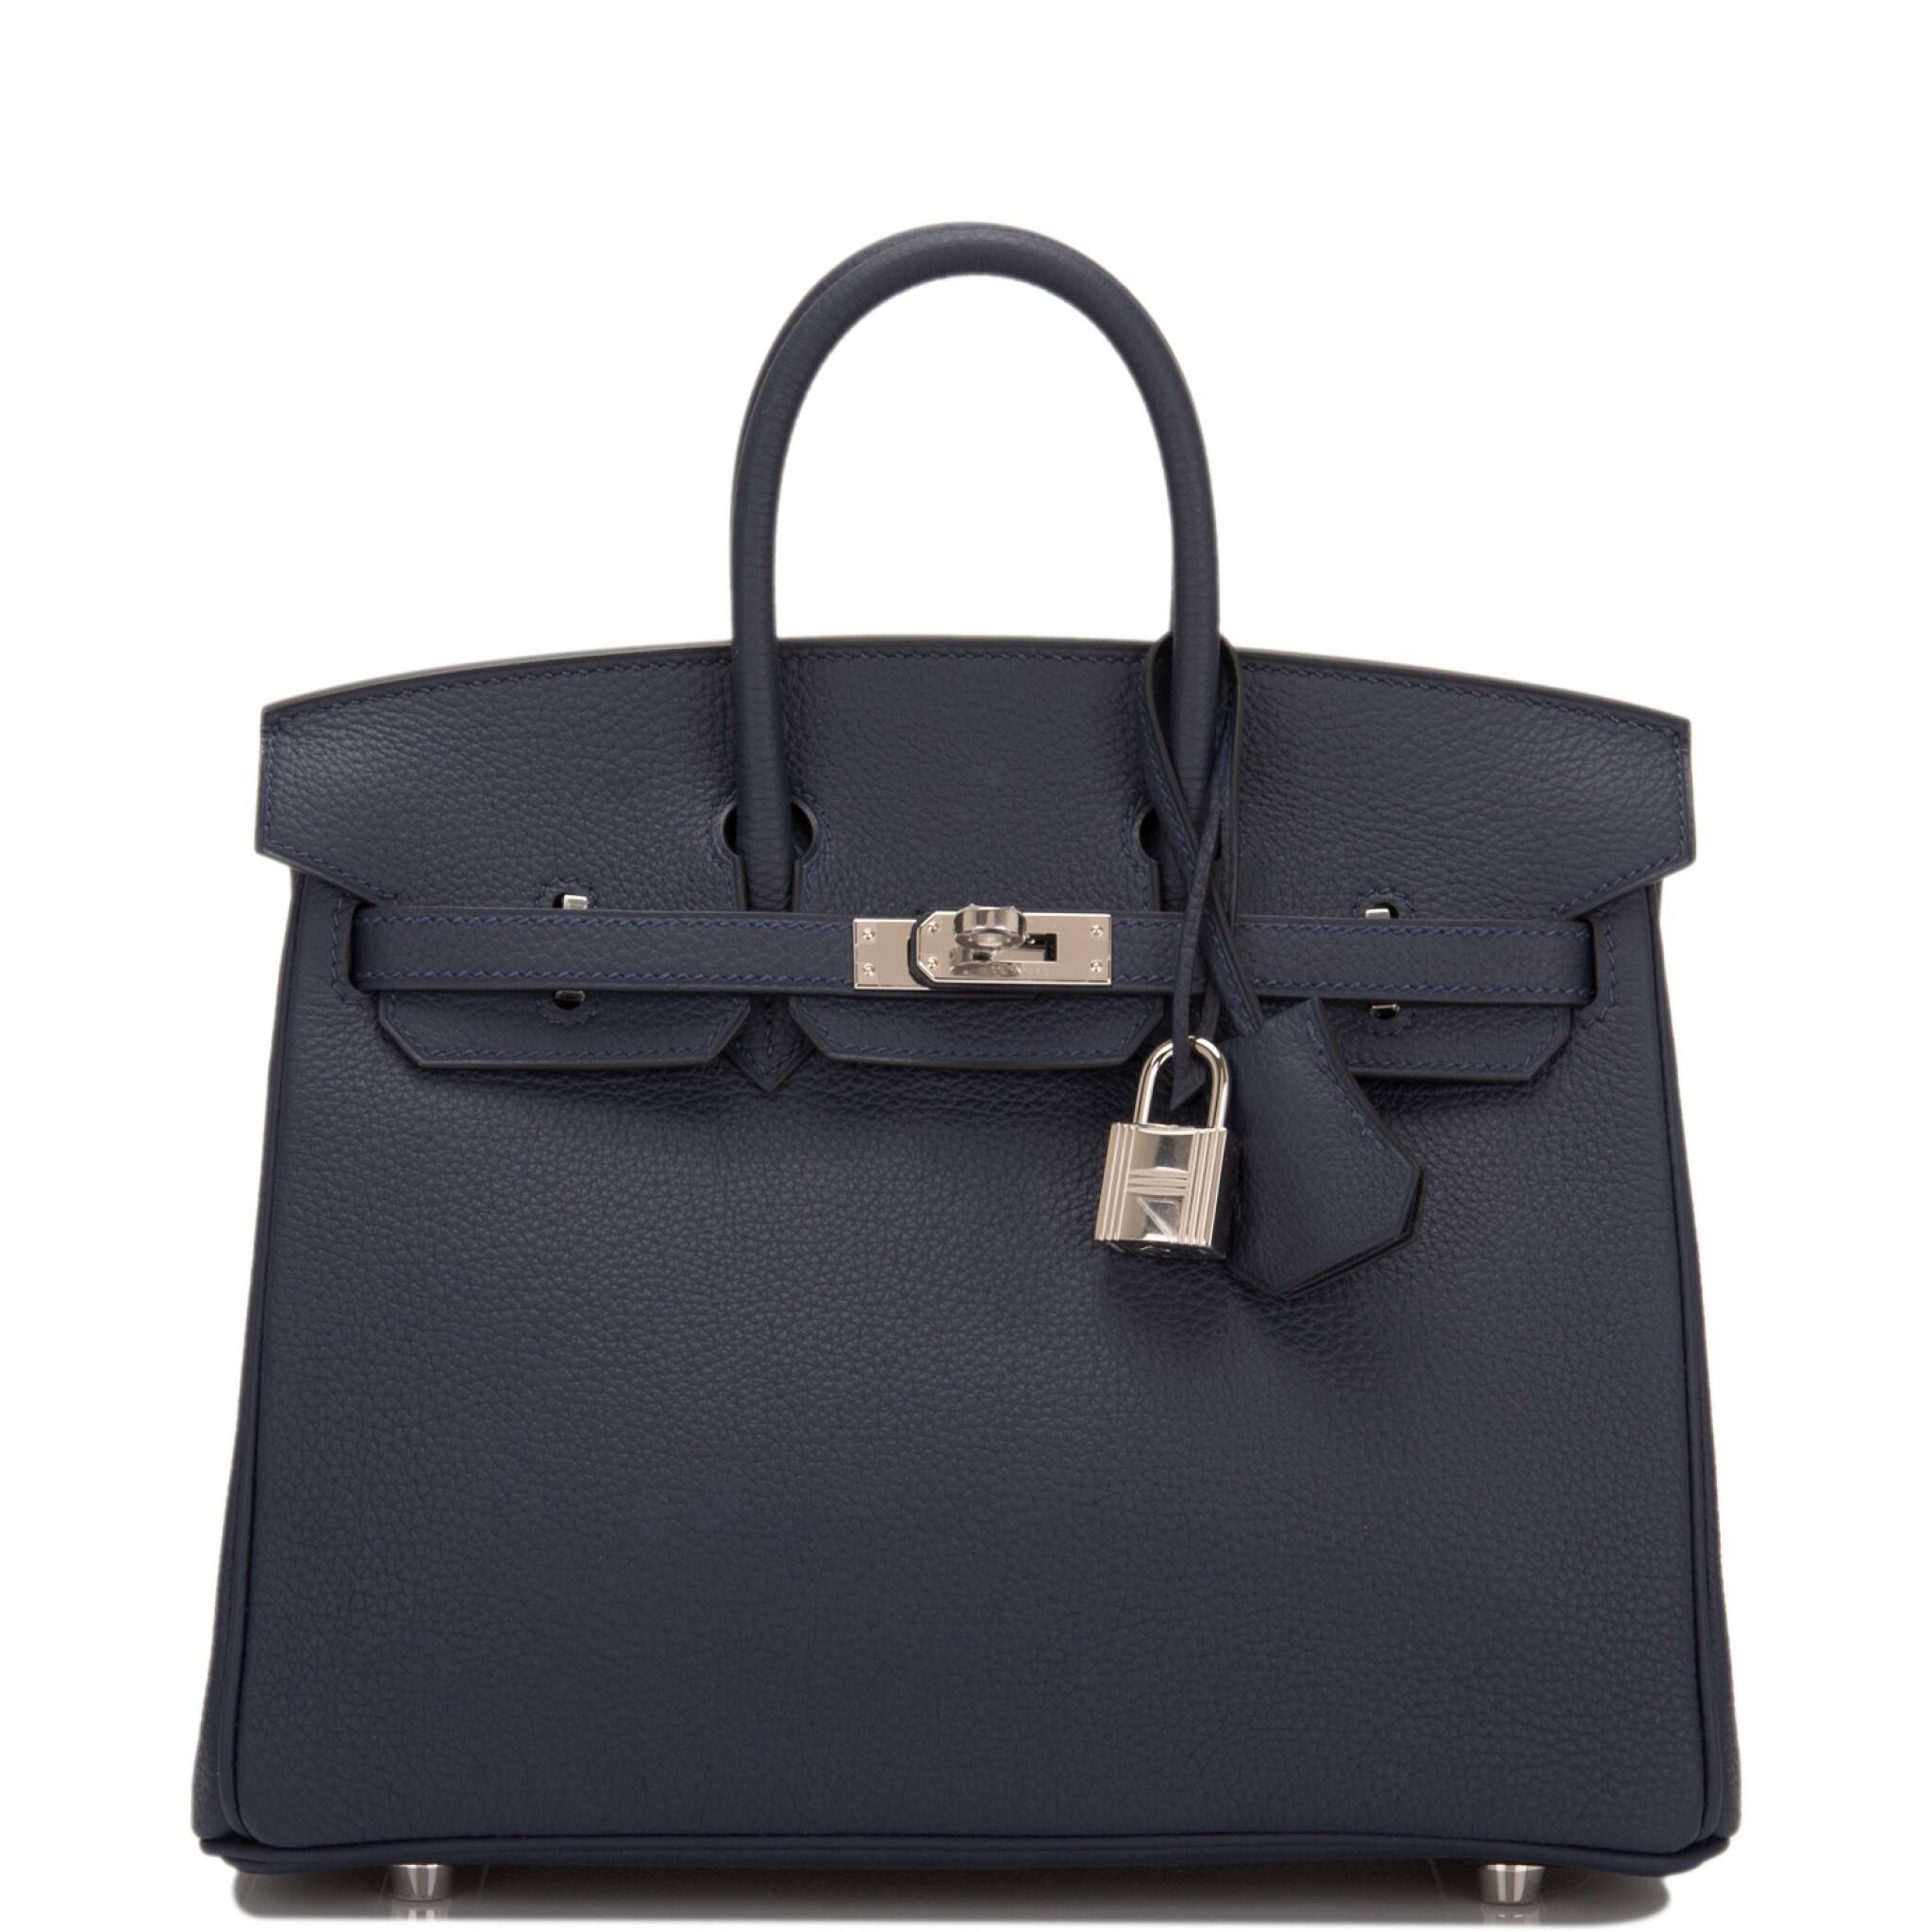 View full screen - View 1 of Lot 4. Hermès Bleu Nuit Birkin 25cm of Togo Leather with Palladium Hardware.